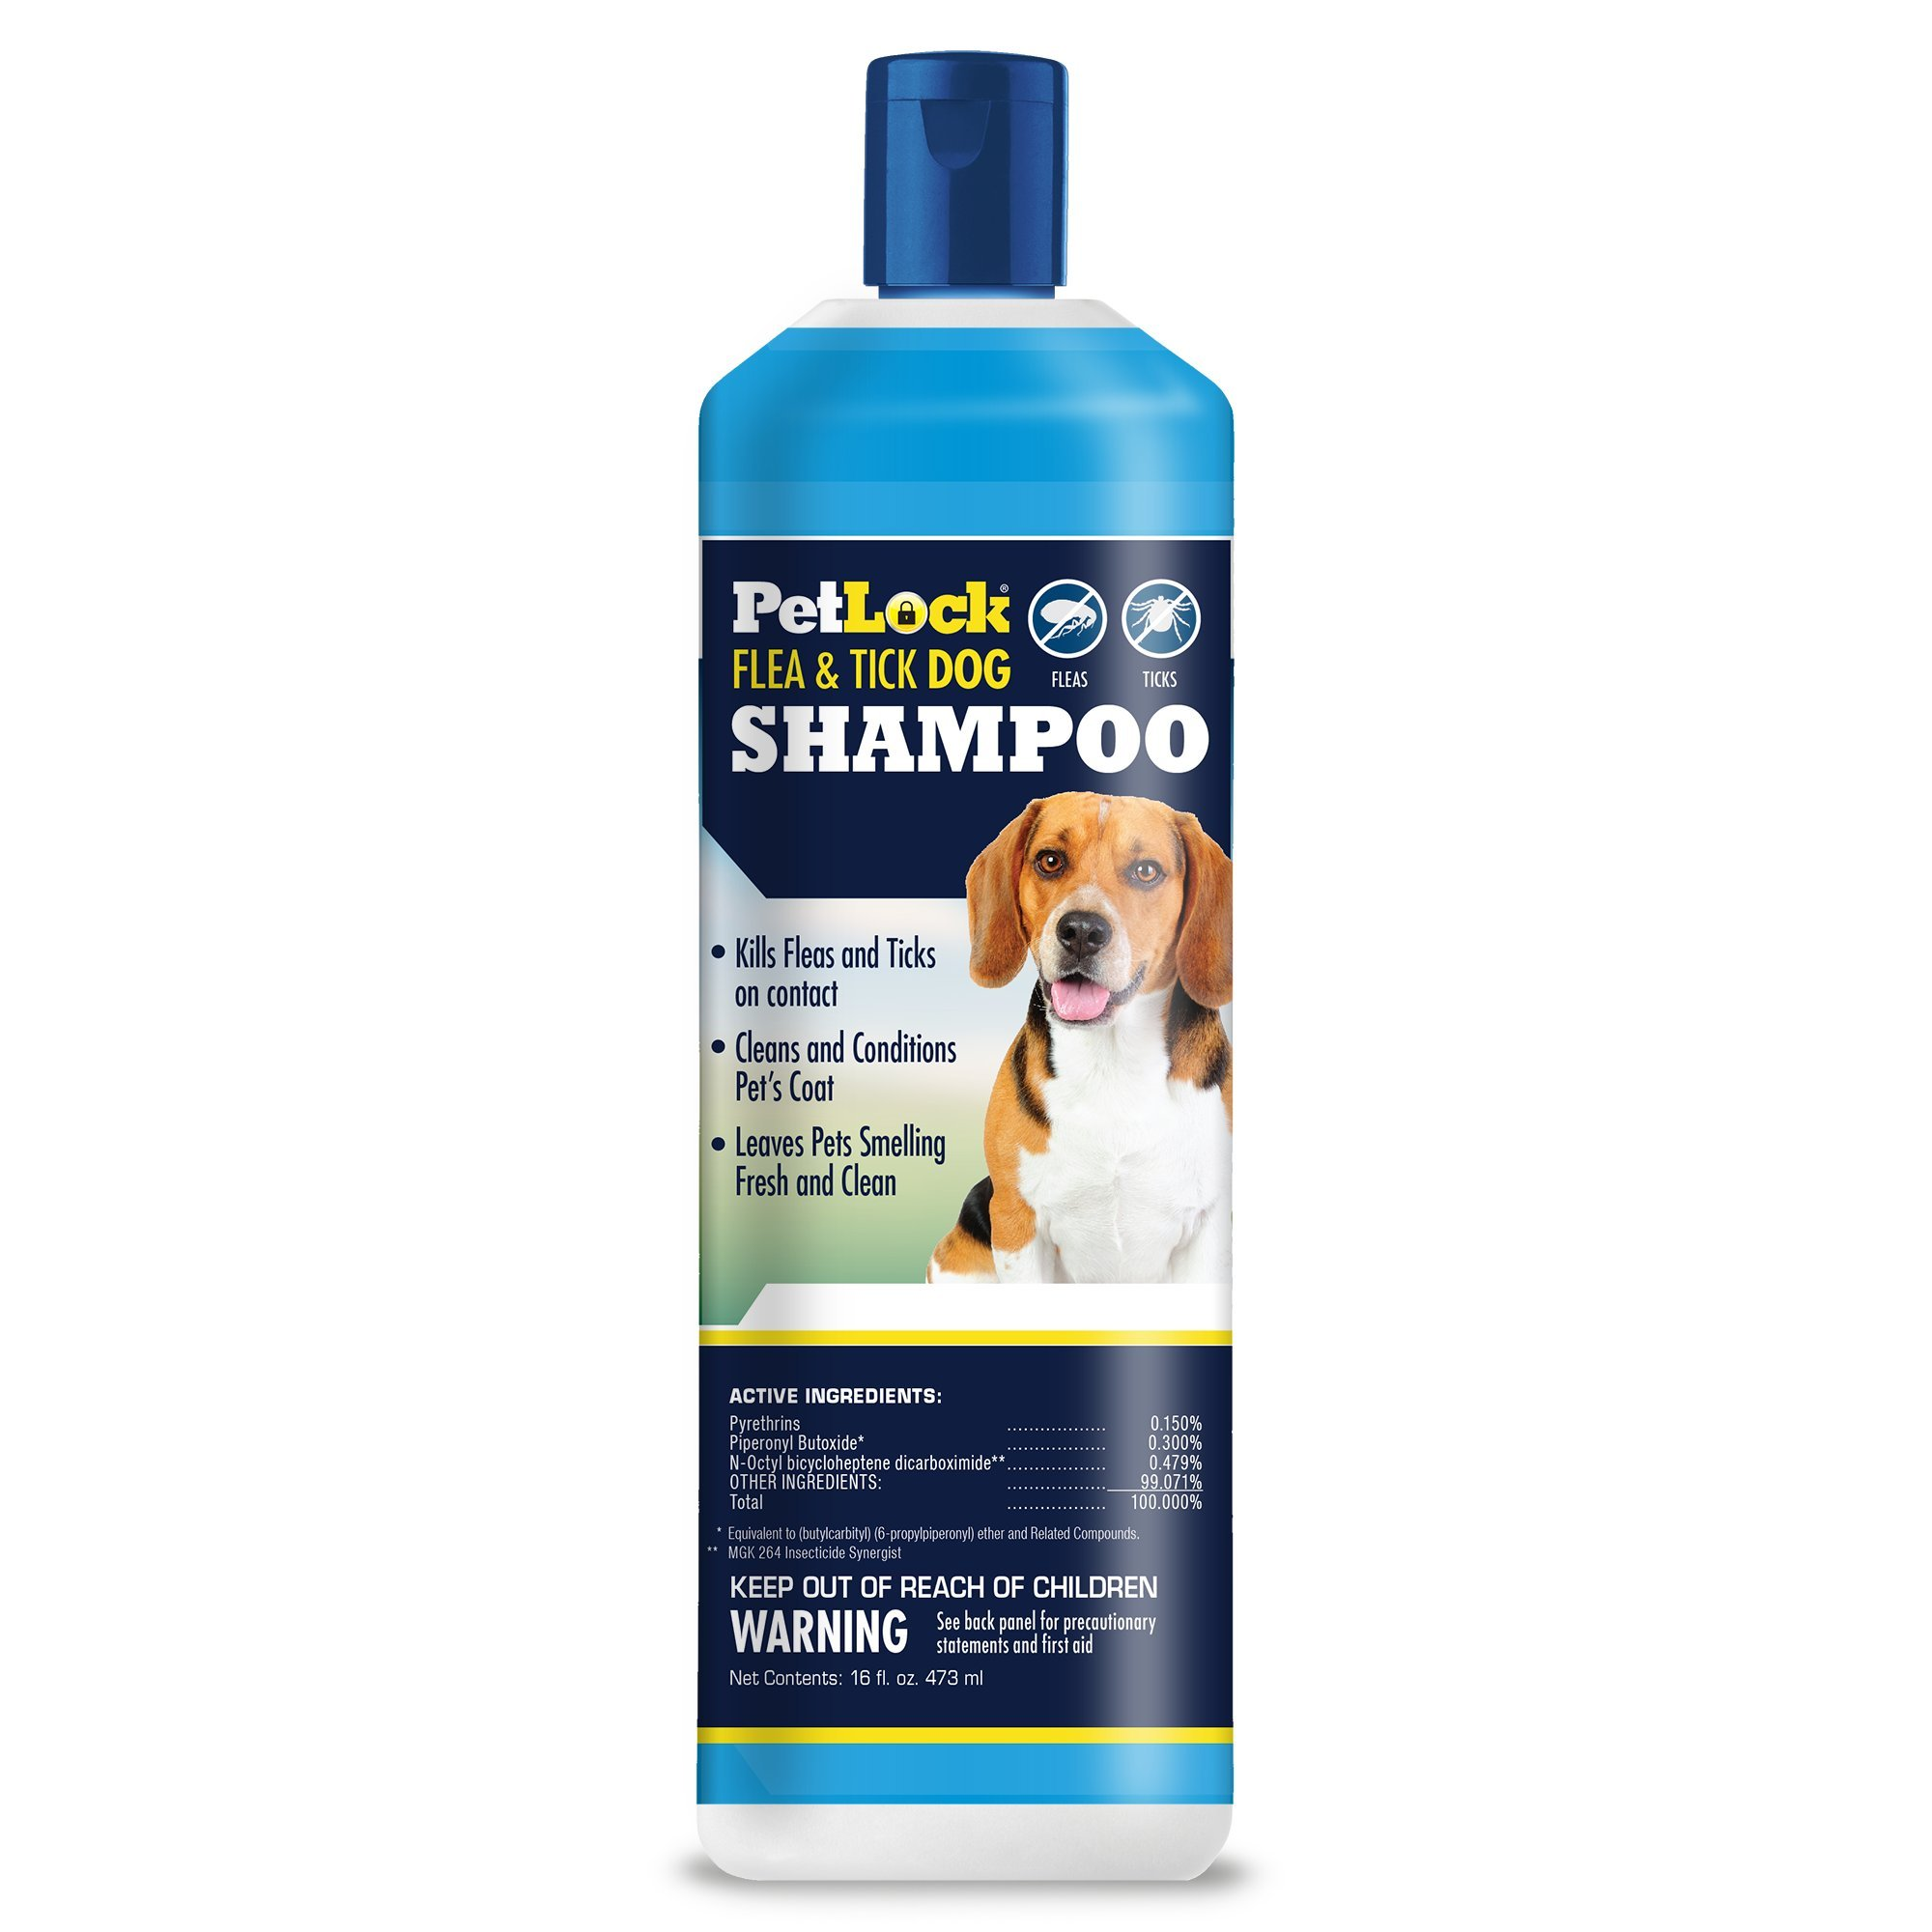 Flea&Tick Dog Shamp16oz by Petlock